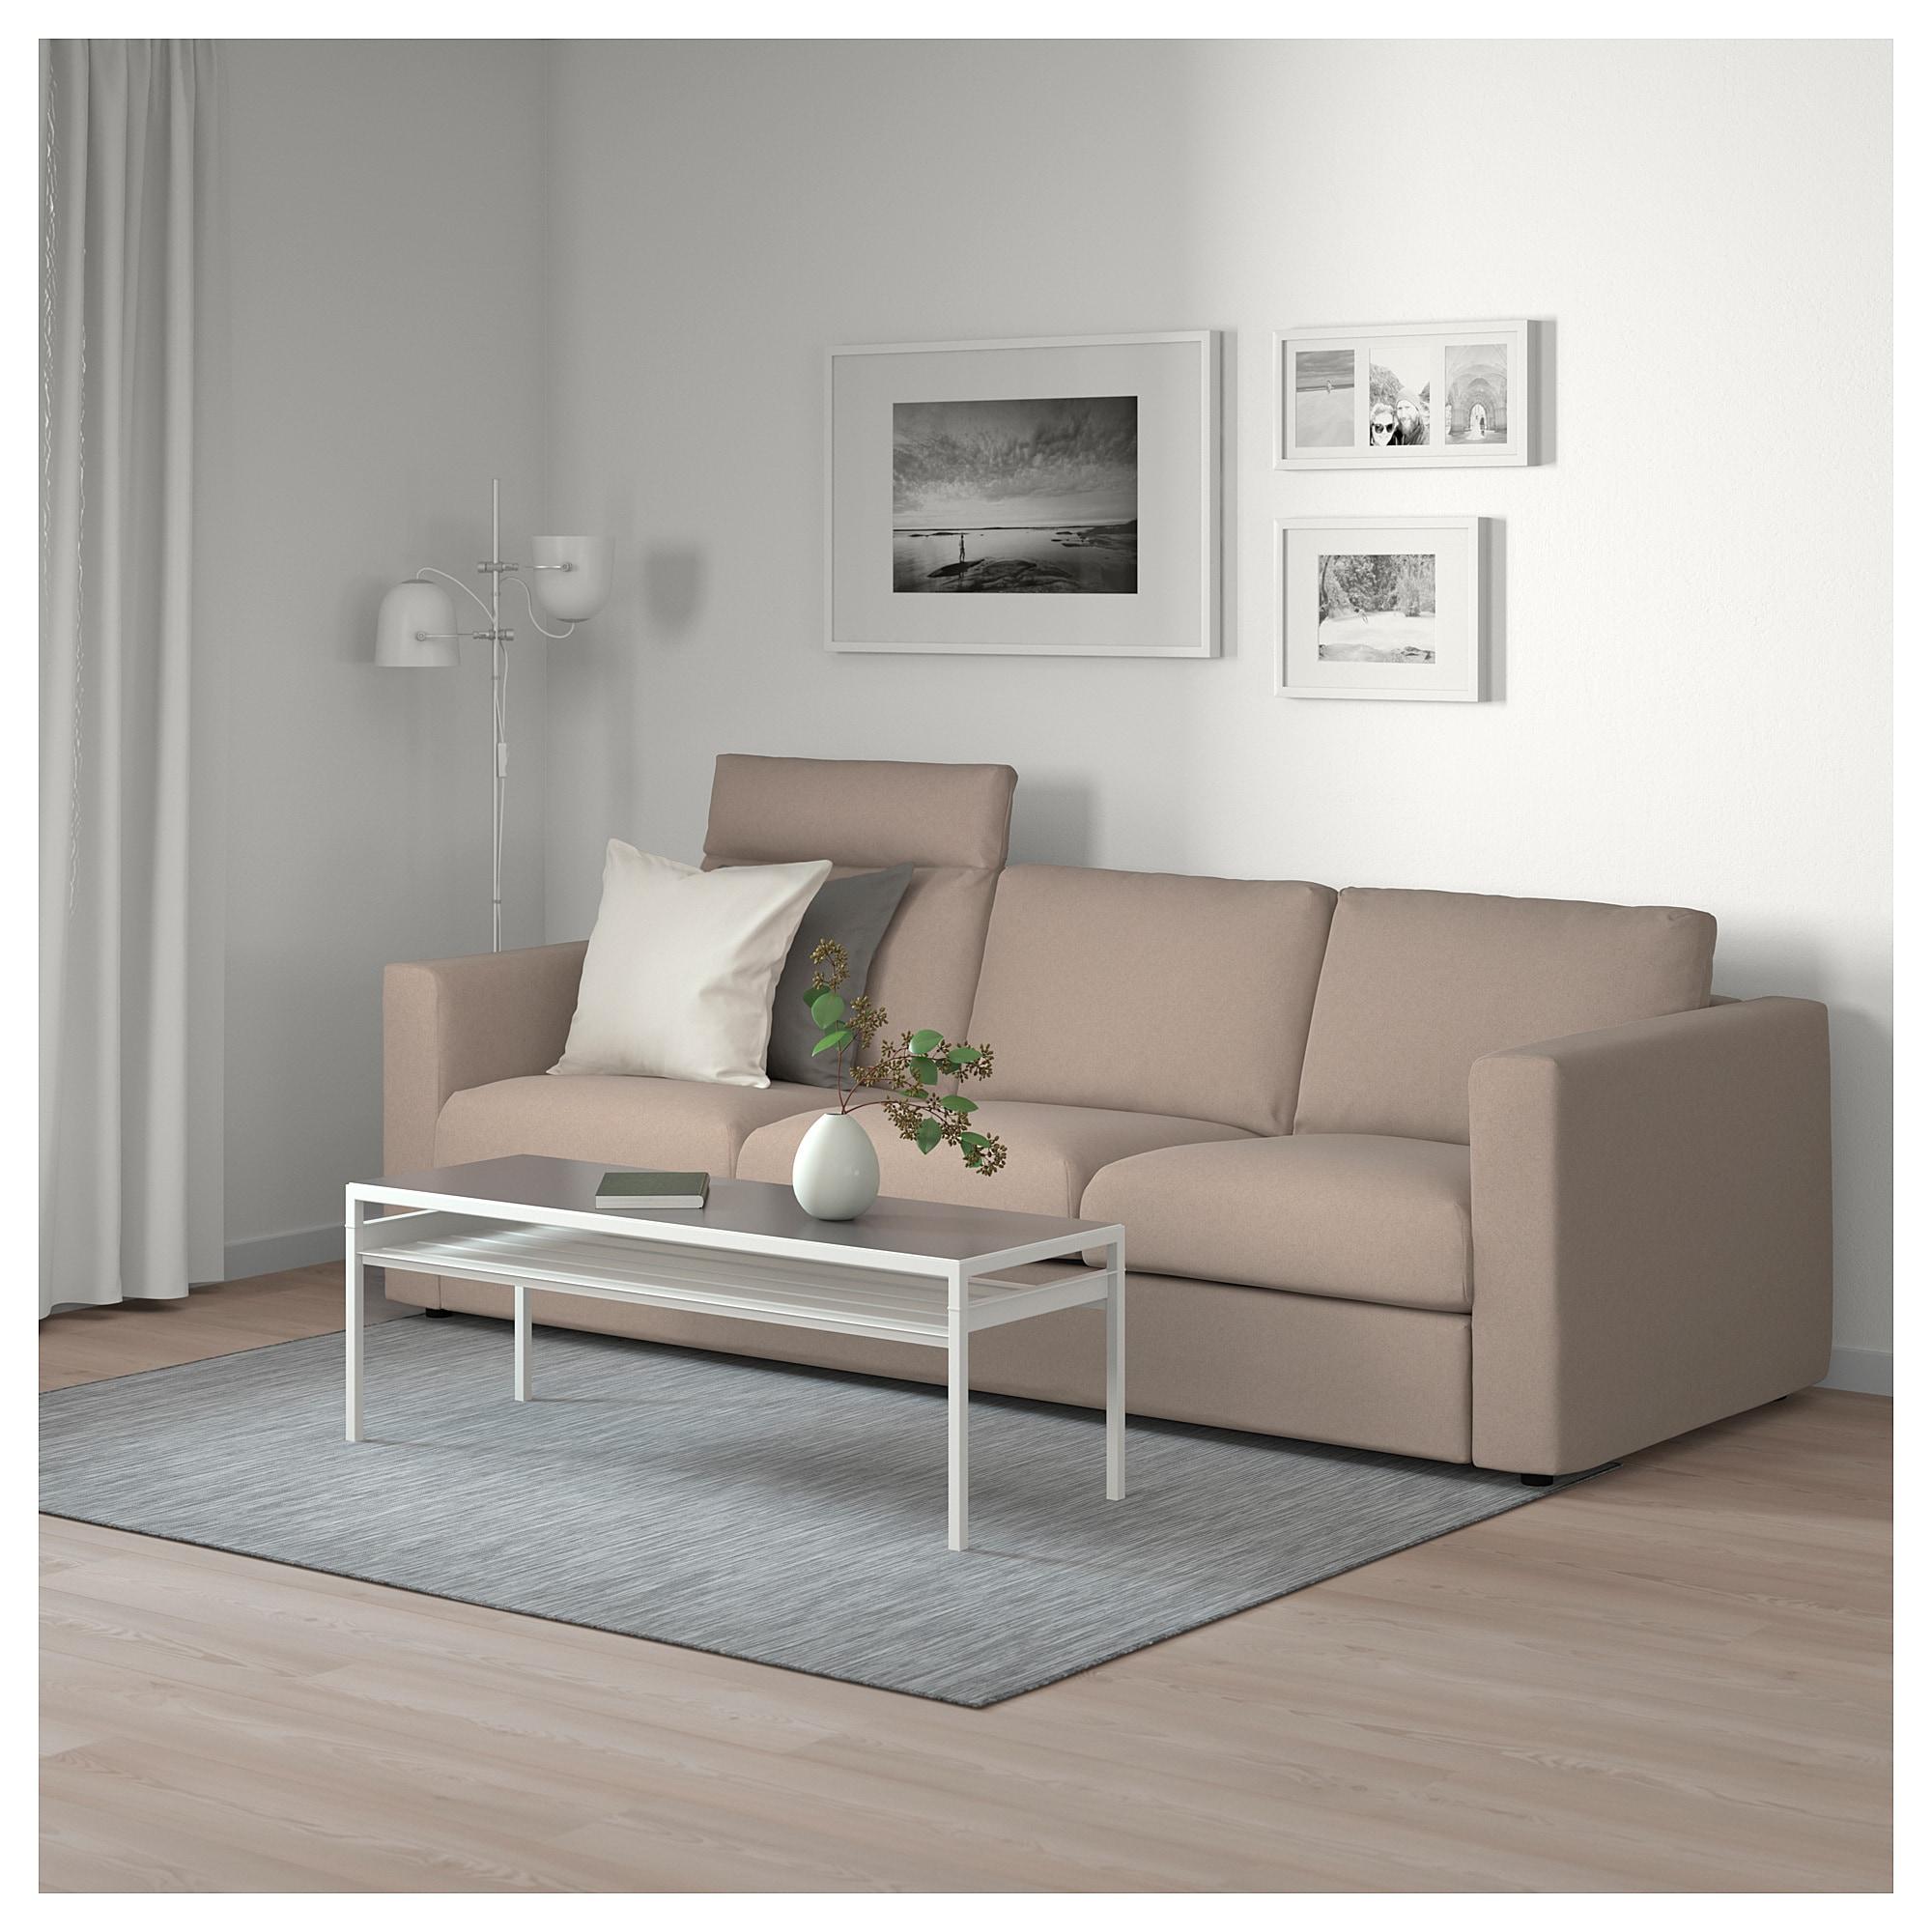 Ikea Sofa Weiß Stoff - Test 9